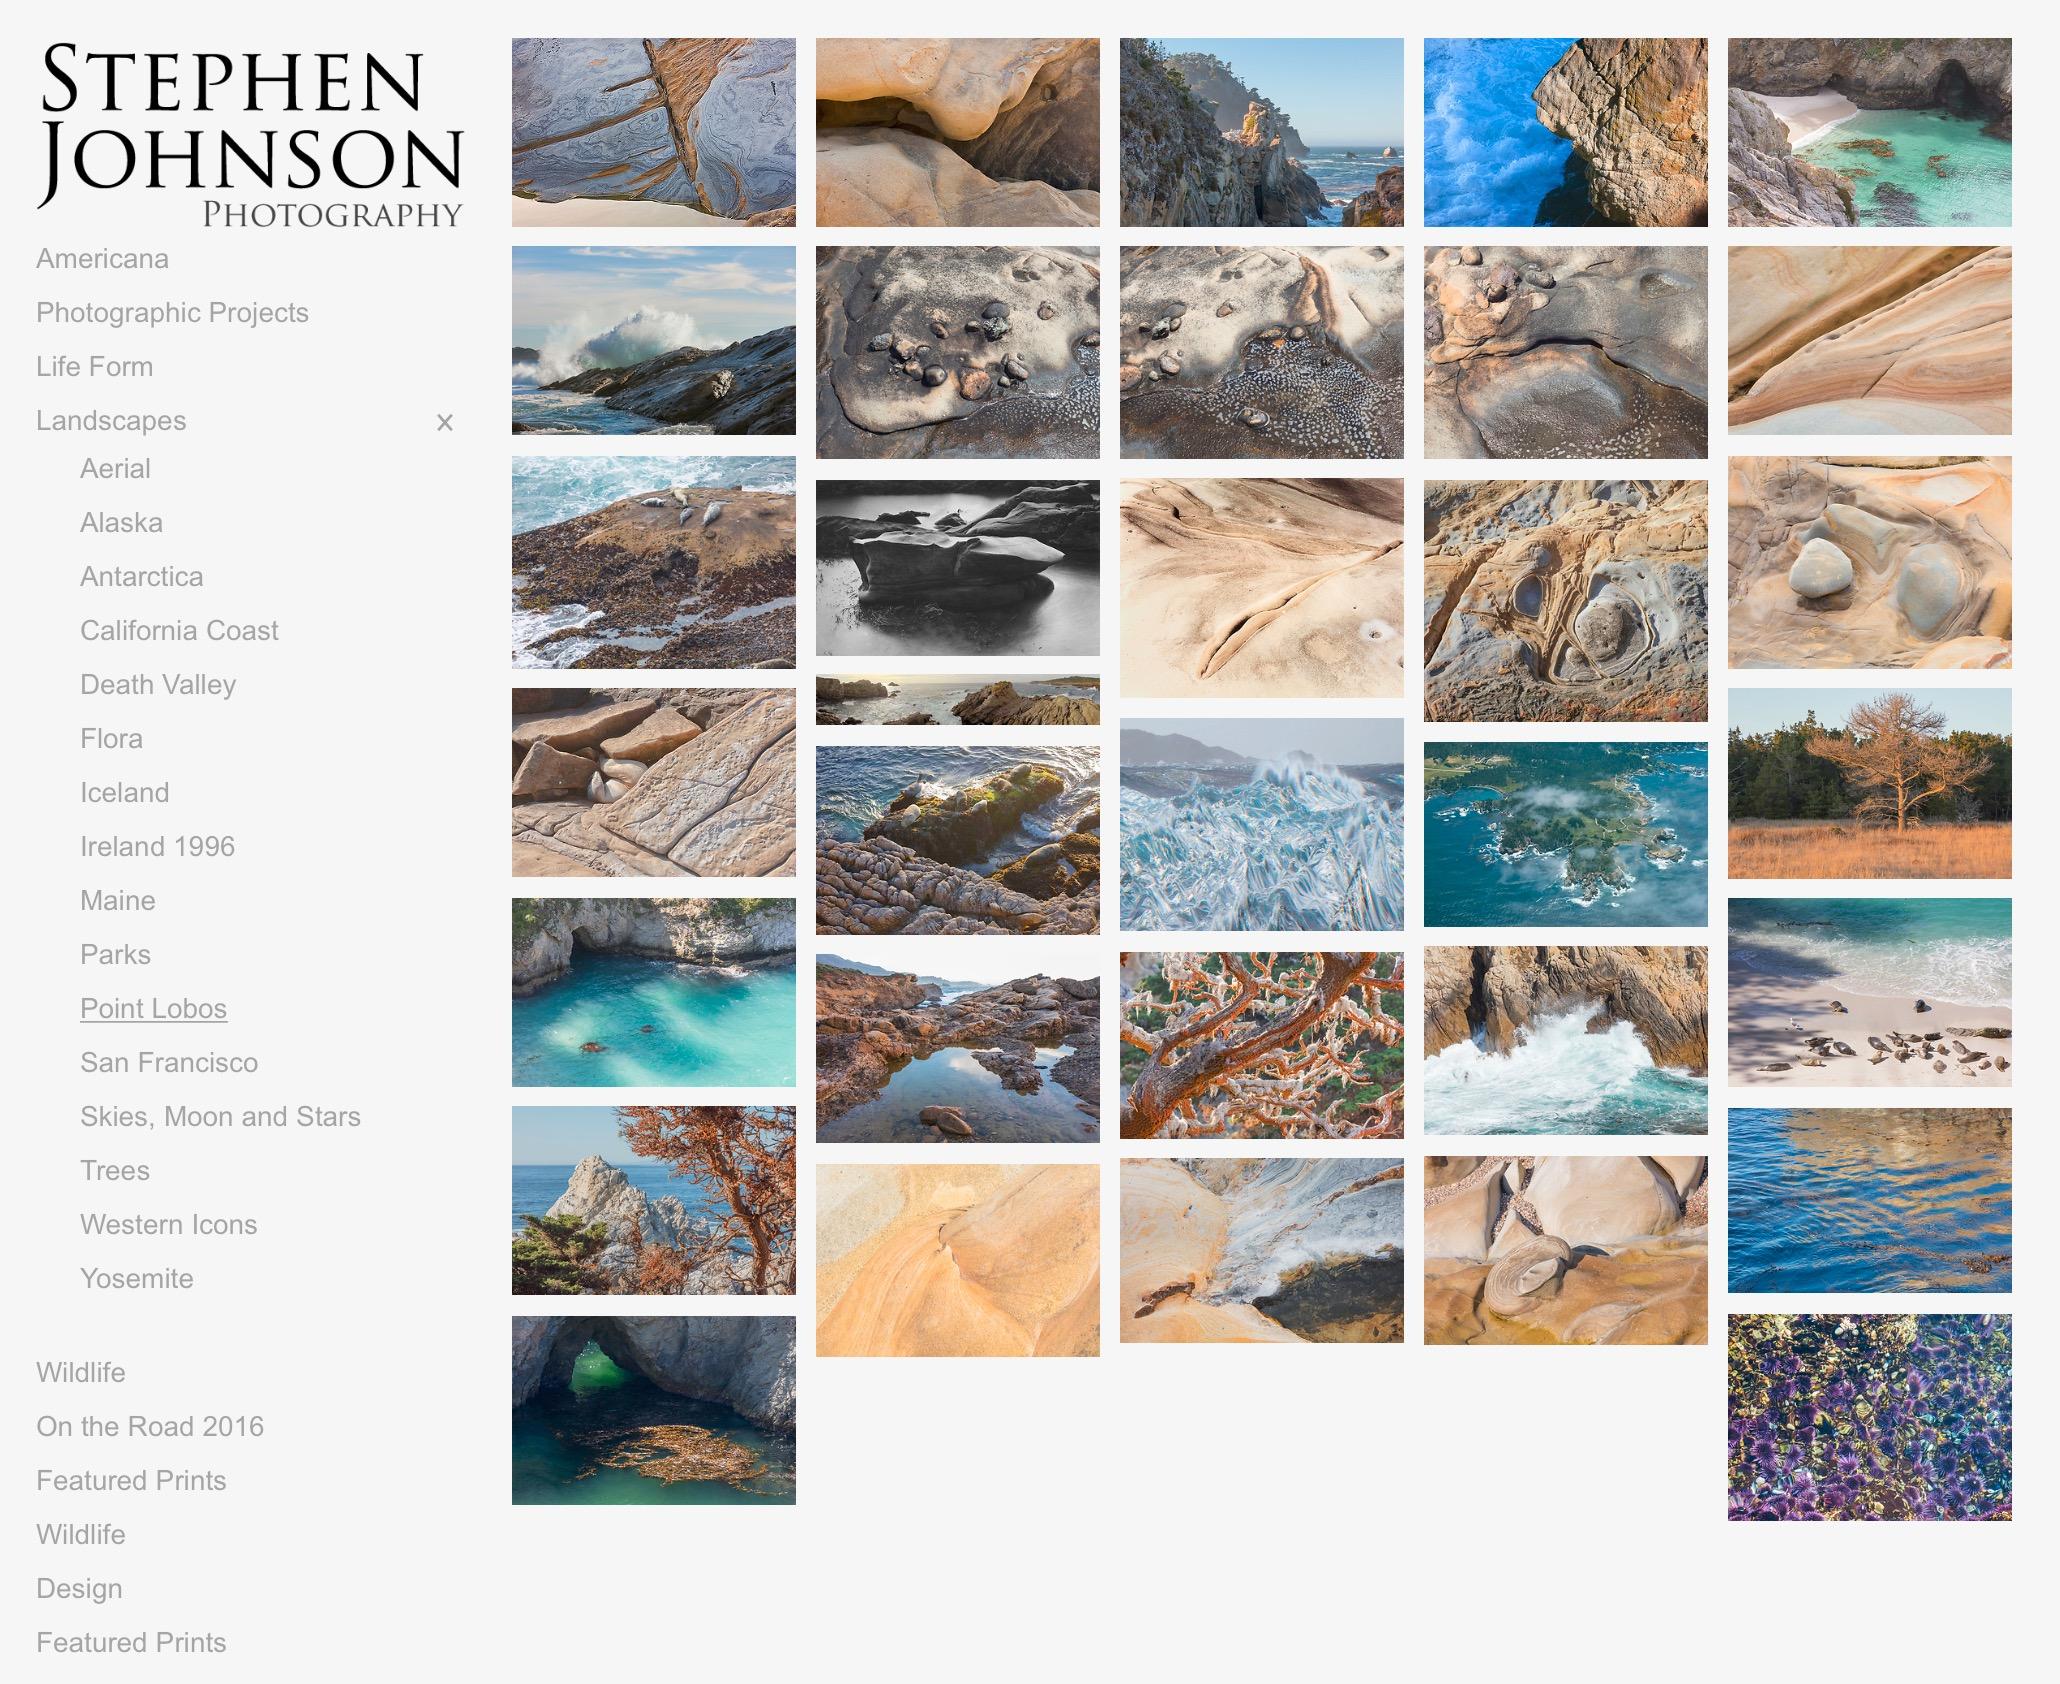 Point Lobos Galleries